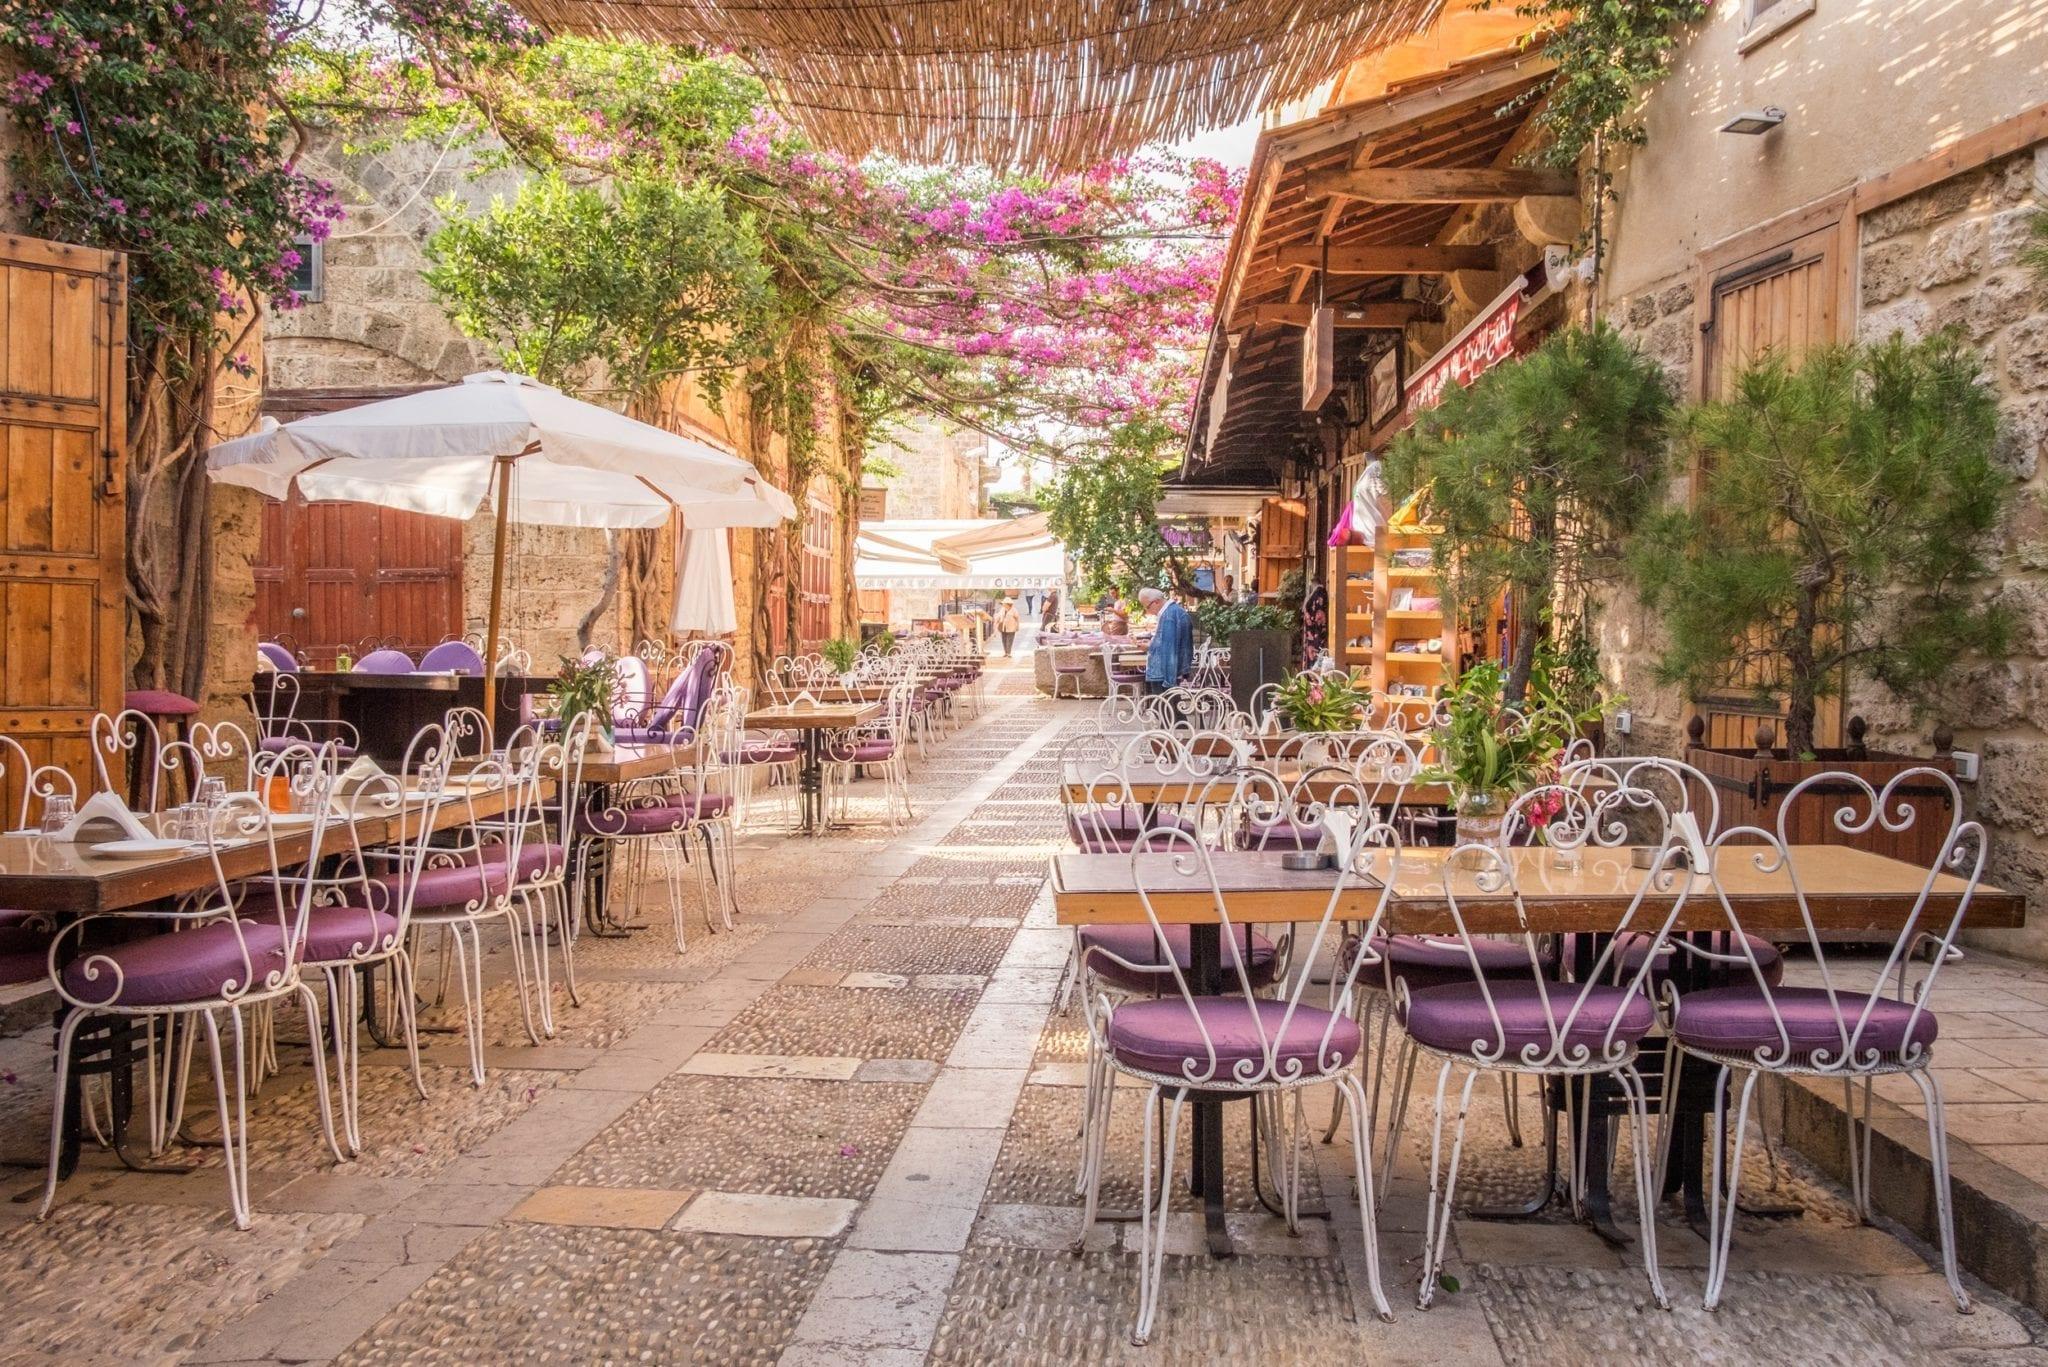 What's it Really Like to Travel Lebanon? - Adventurous Kate